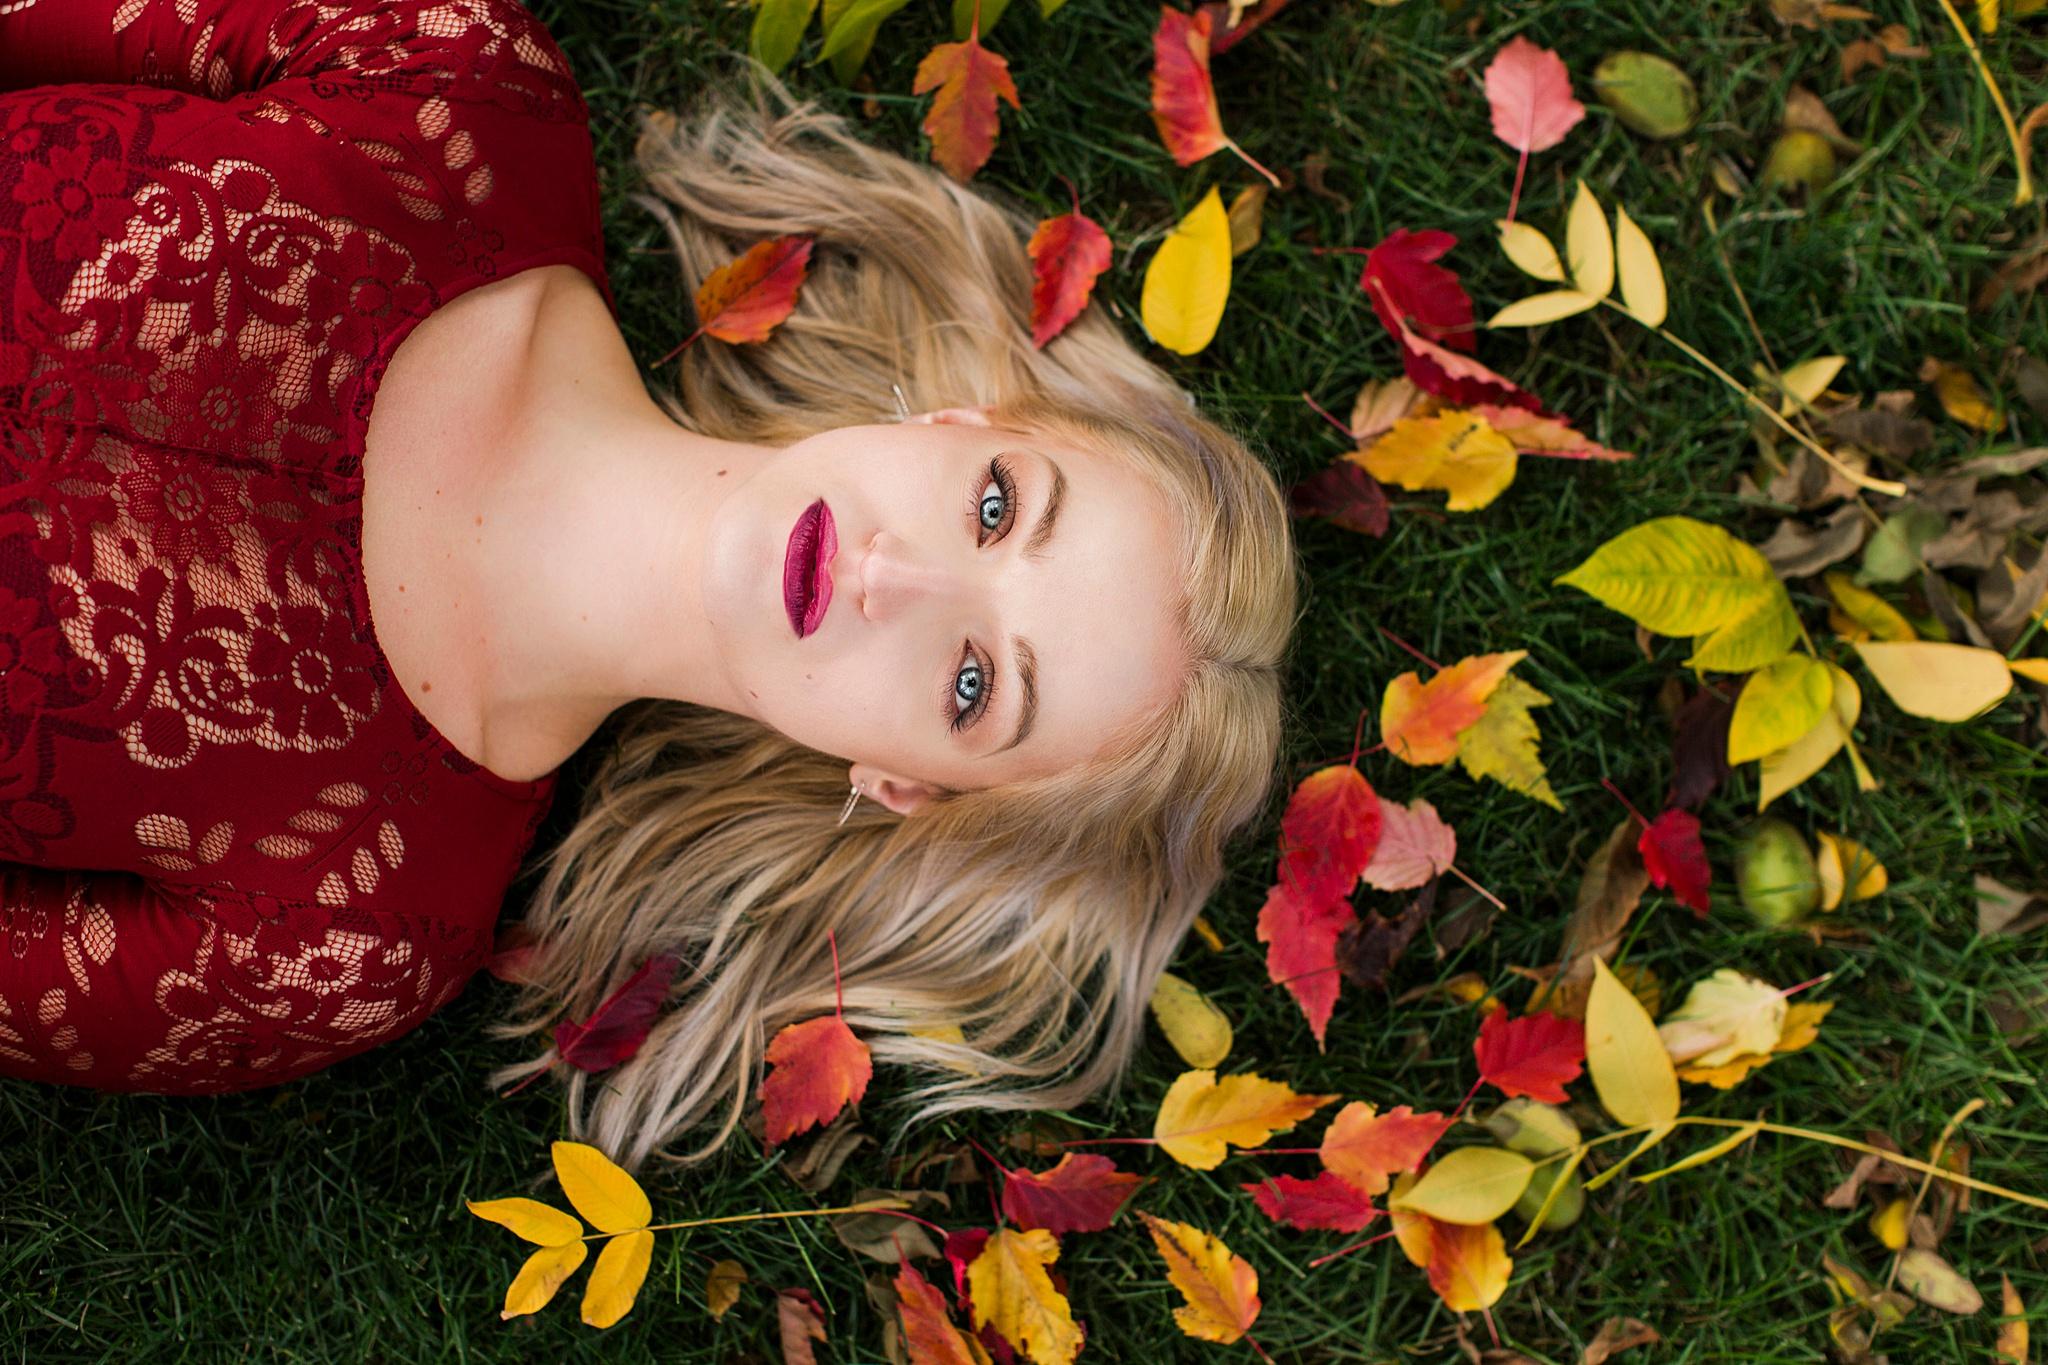 edmonton fashion photographer 7.jpg